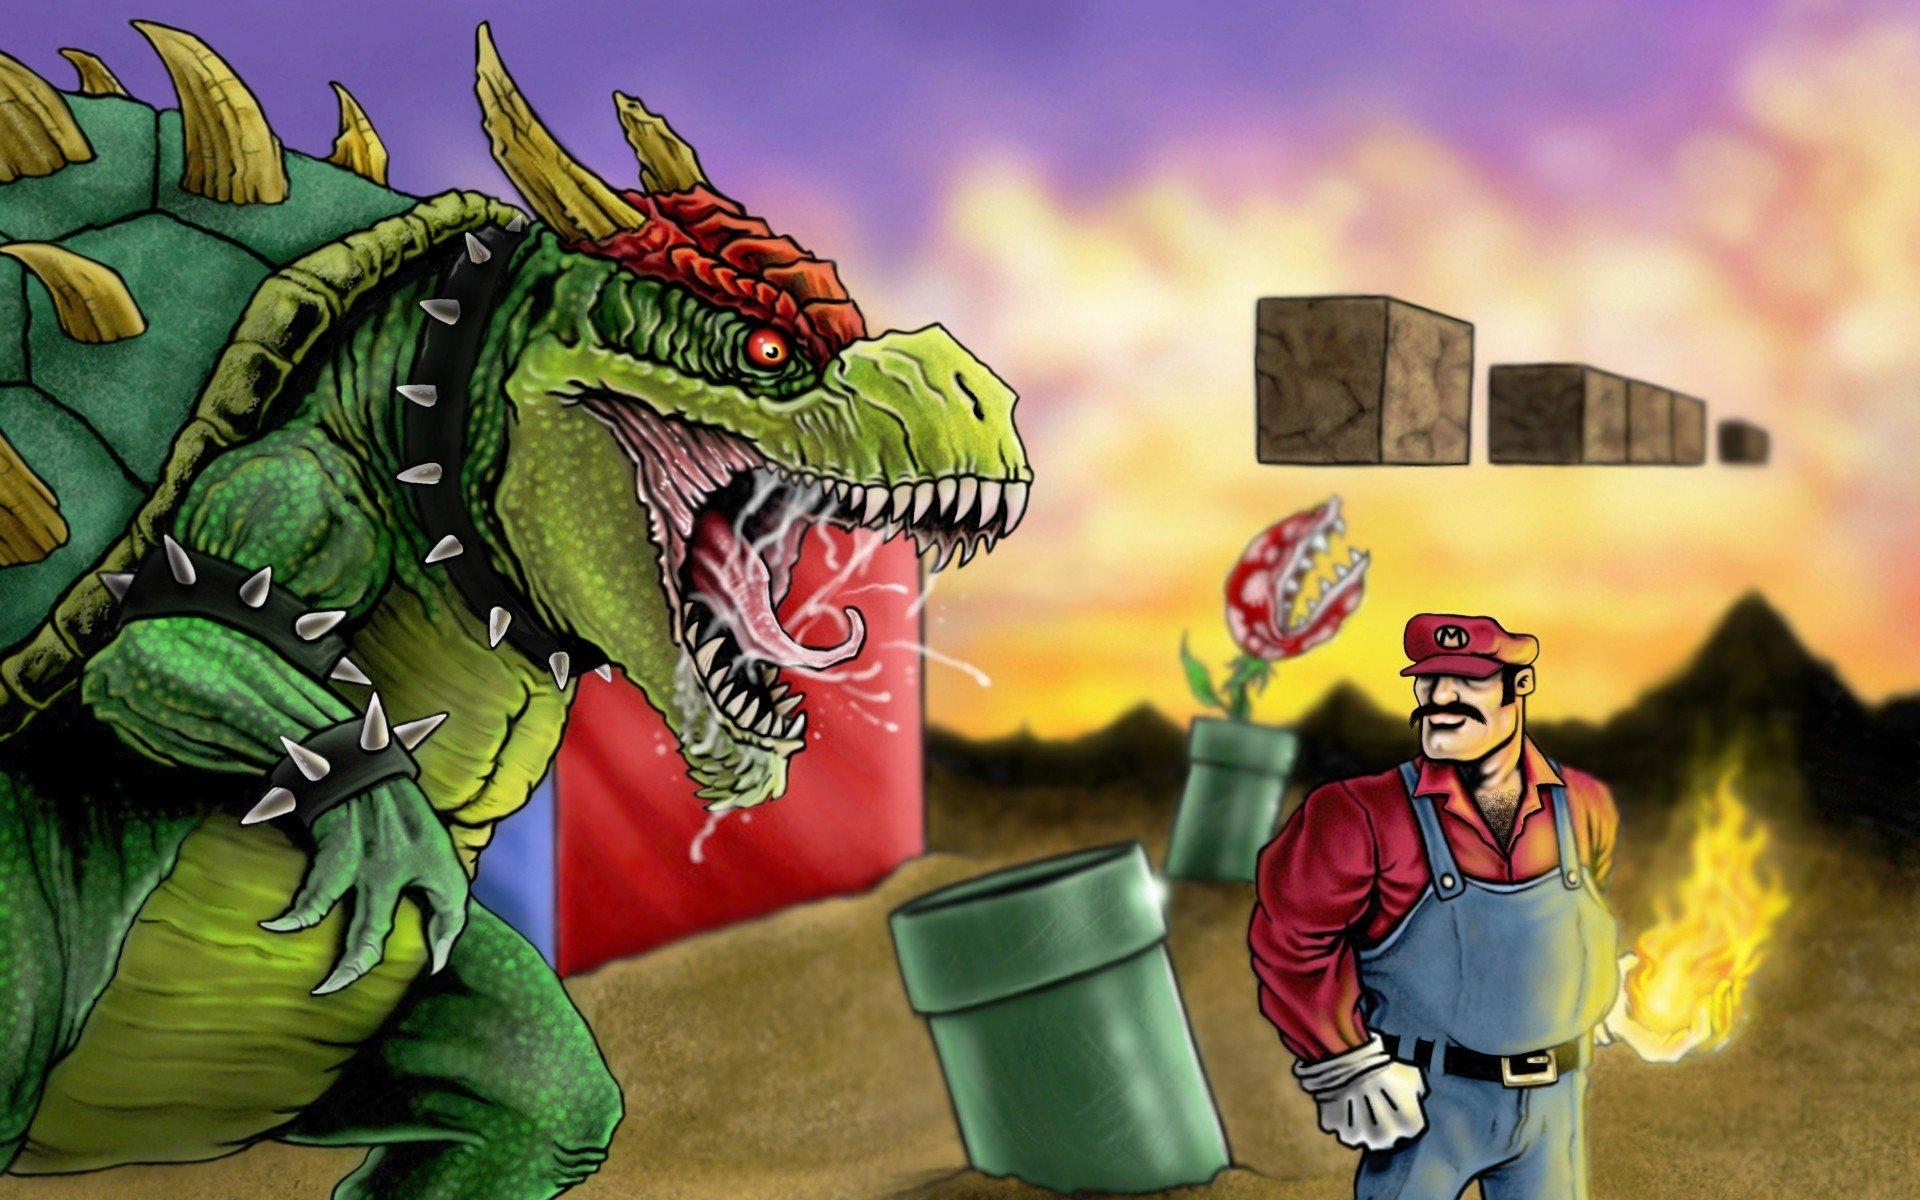 Mario Bros Super Mario Bowser Artwork Realistic Game